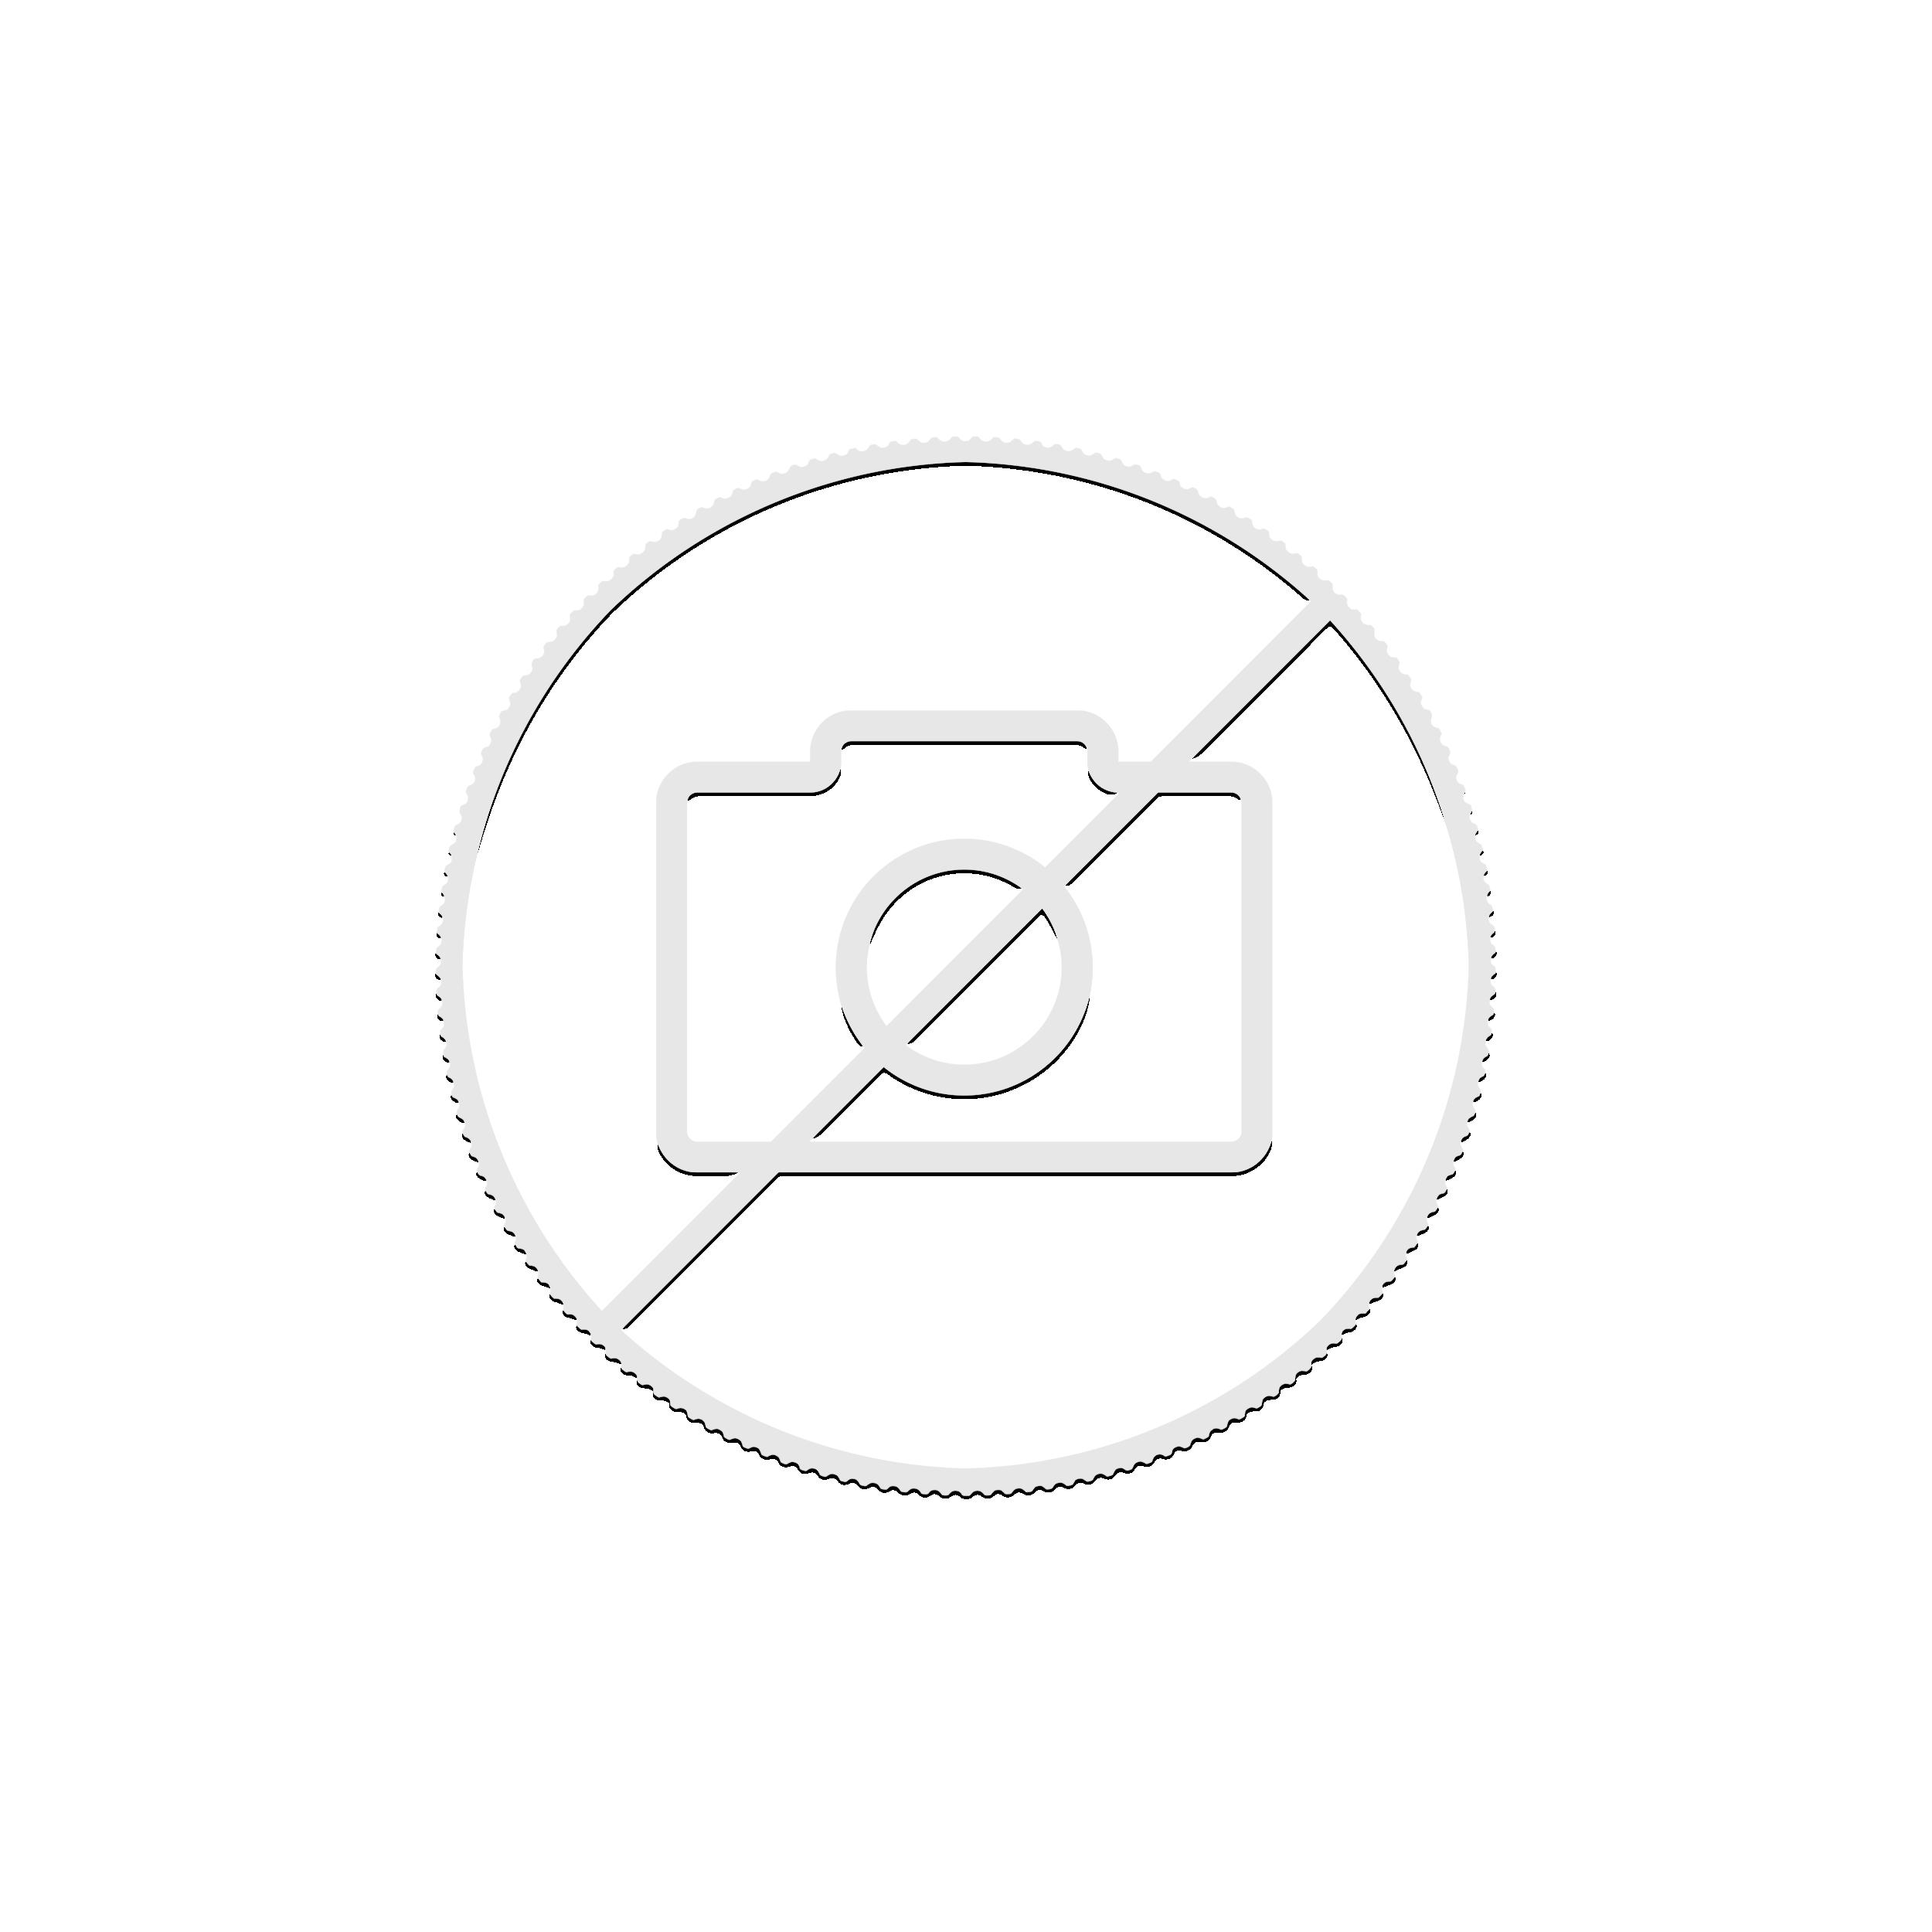 1/4 Troy ounce gold Krugerrand coin